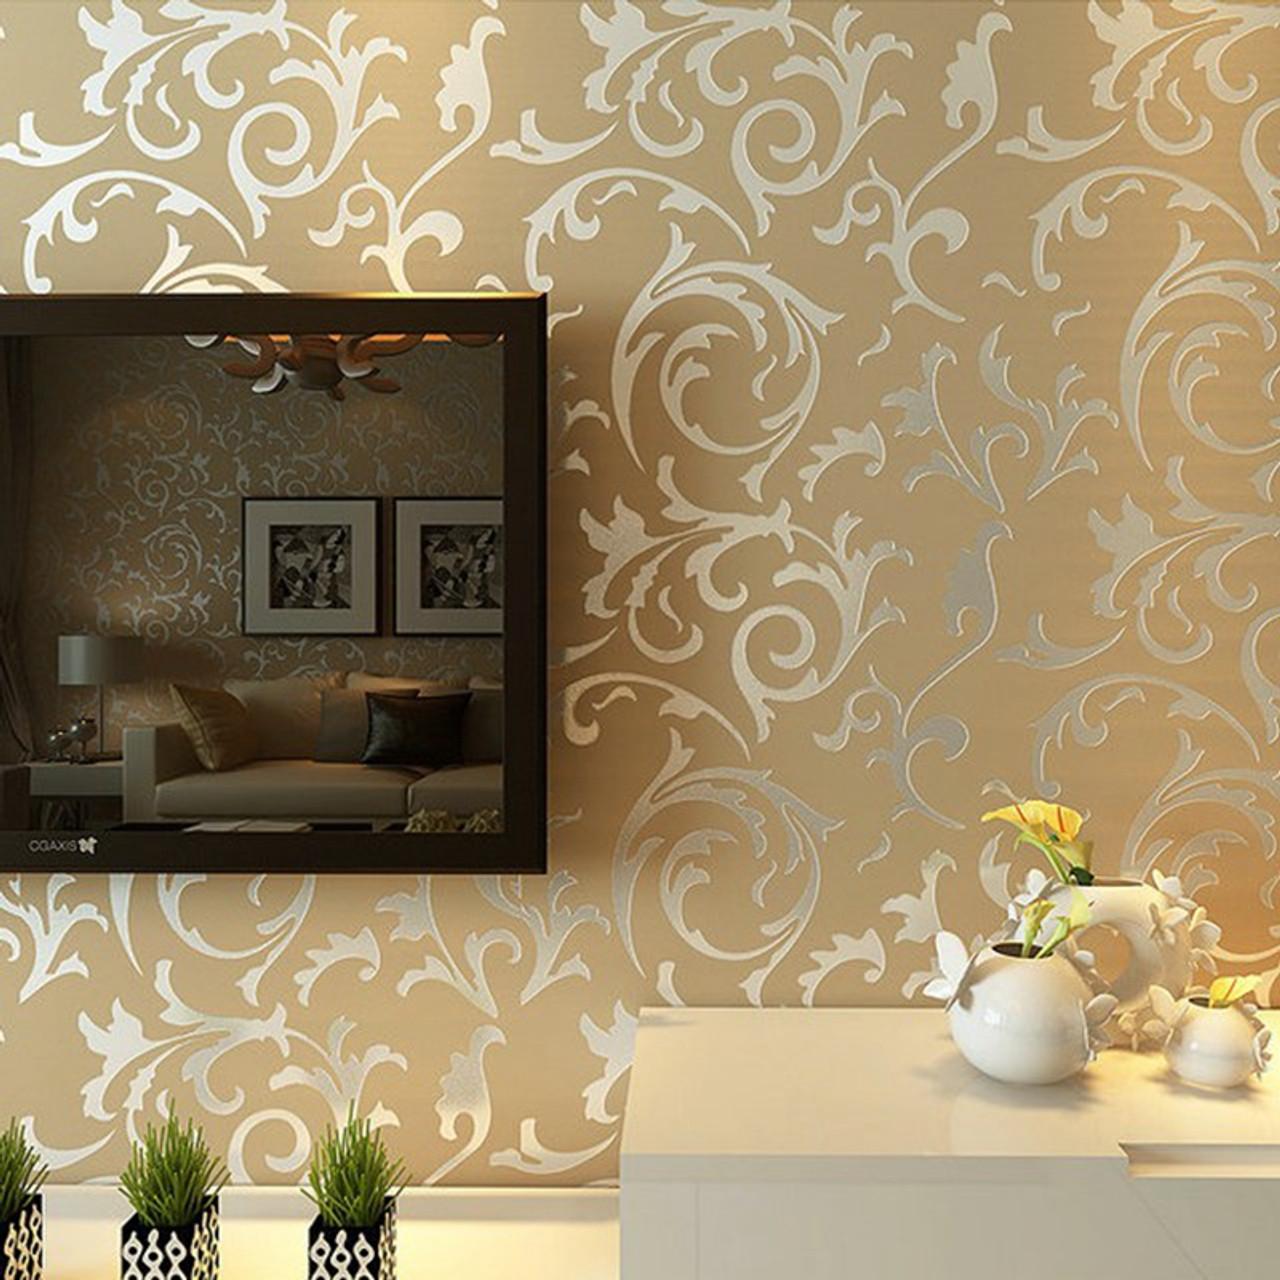 Wallpaper Of Wall: Luxury Grey Silver Leaf 3D Steroscopic Wallpaper For Walls